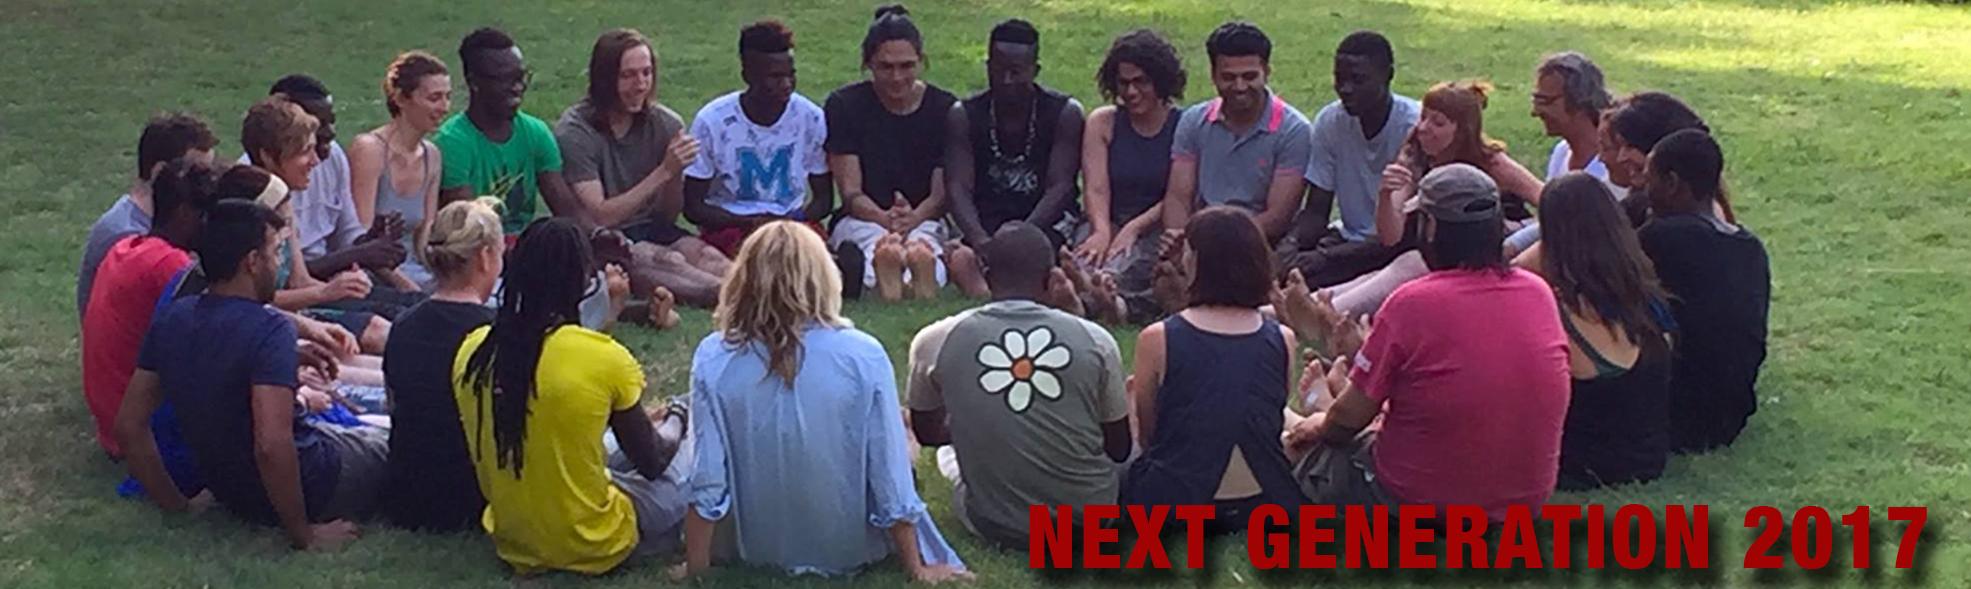 Next Generation 2017